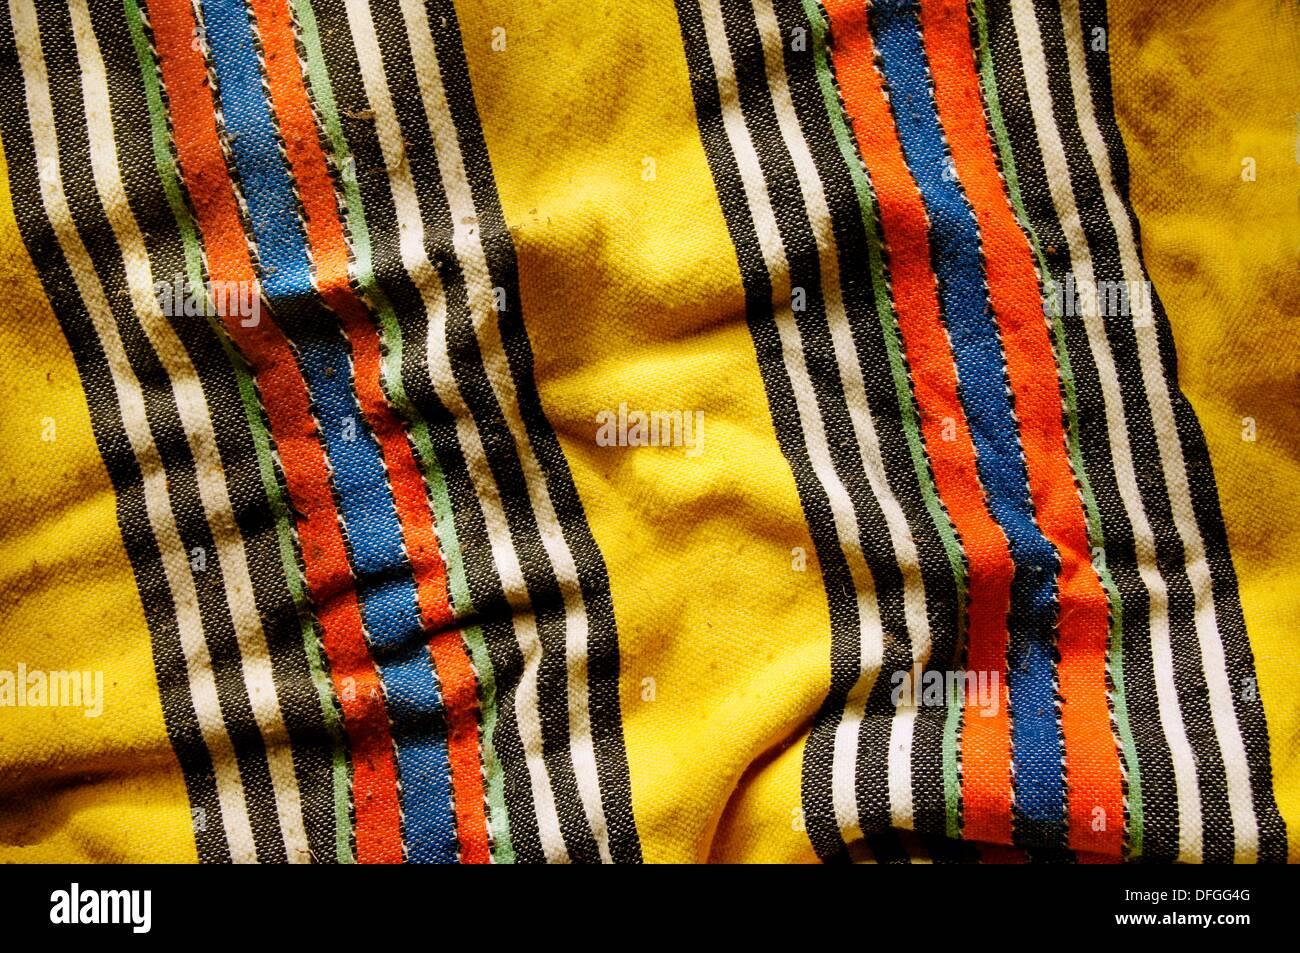 Handicrafts: Berber carpet, Morocco - Stock Image